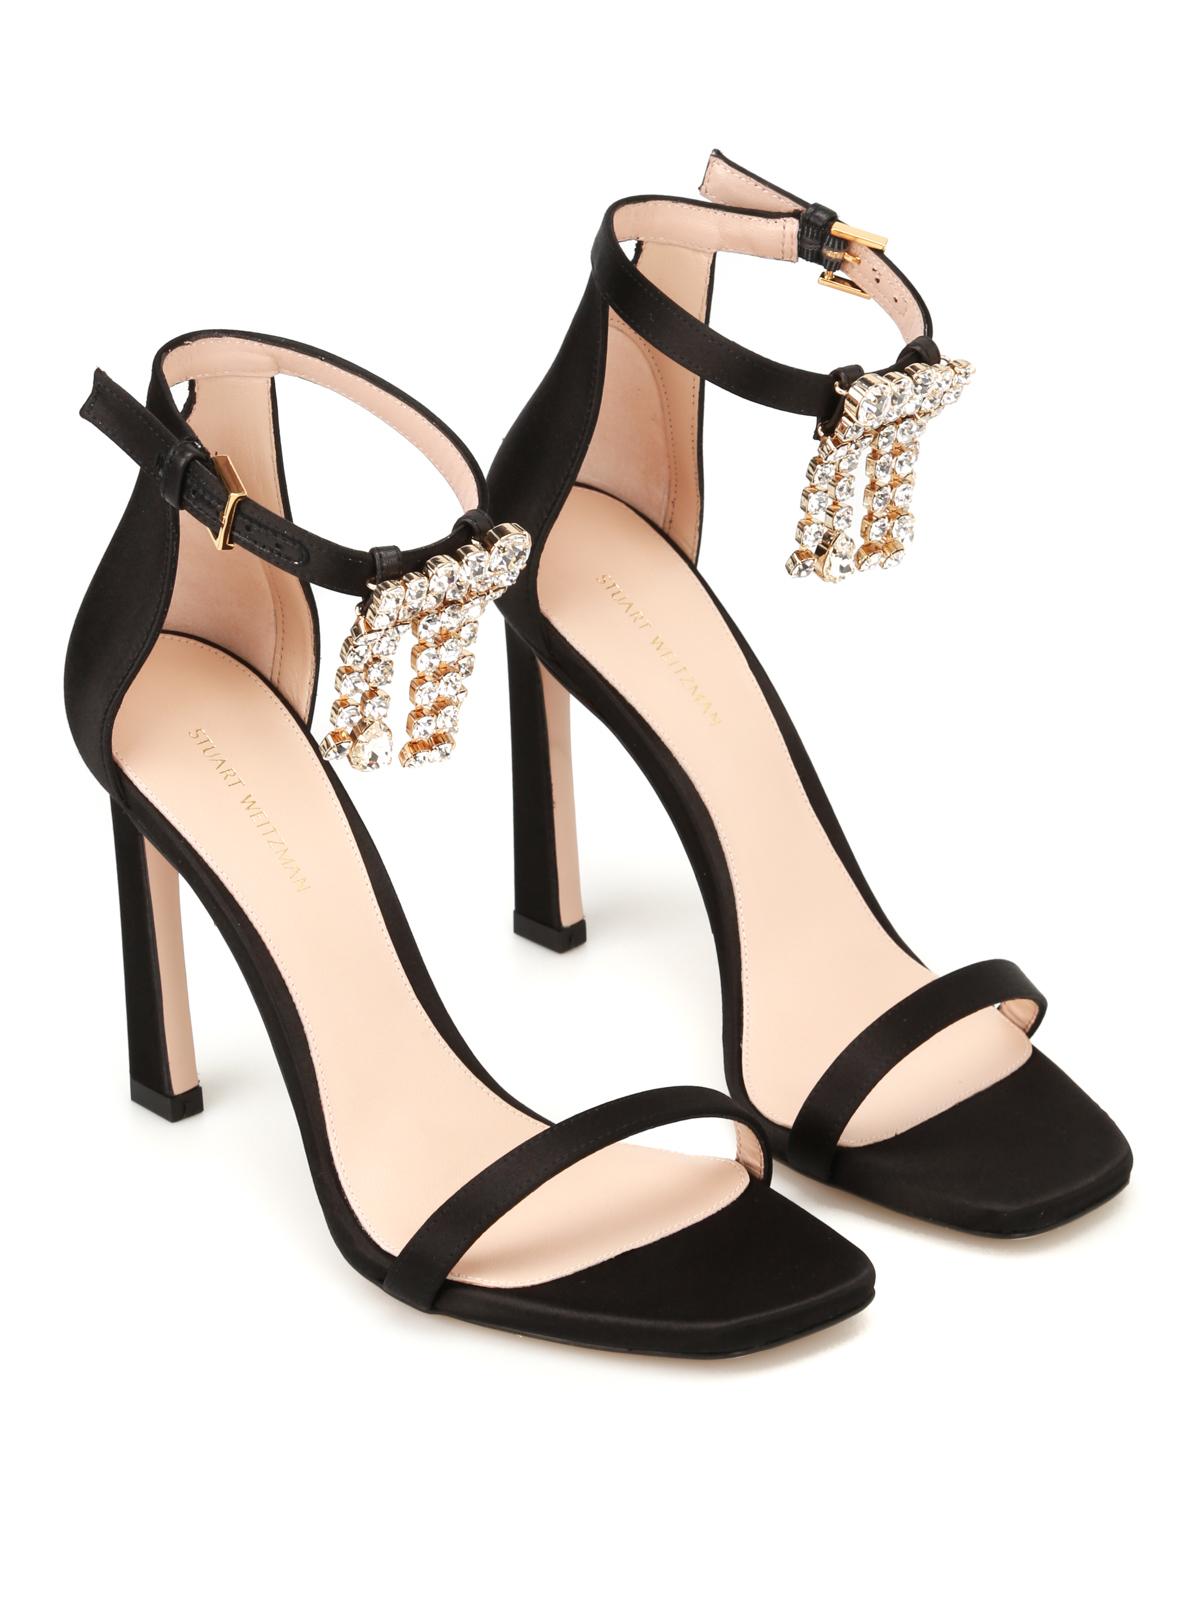 67f51c6f1831 Stuart Weitzman  sandals online - 100Fringesquarenudist satin sandals